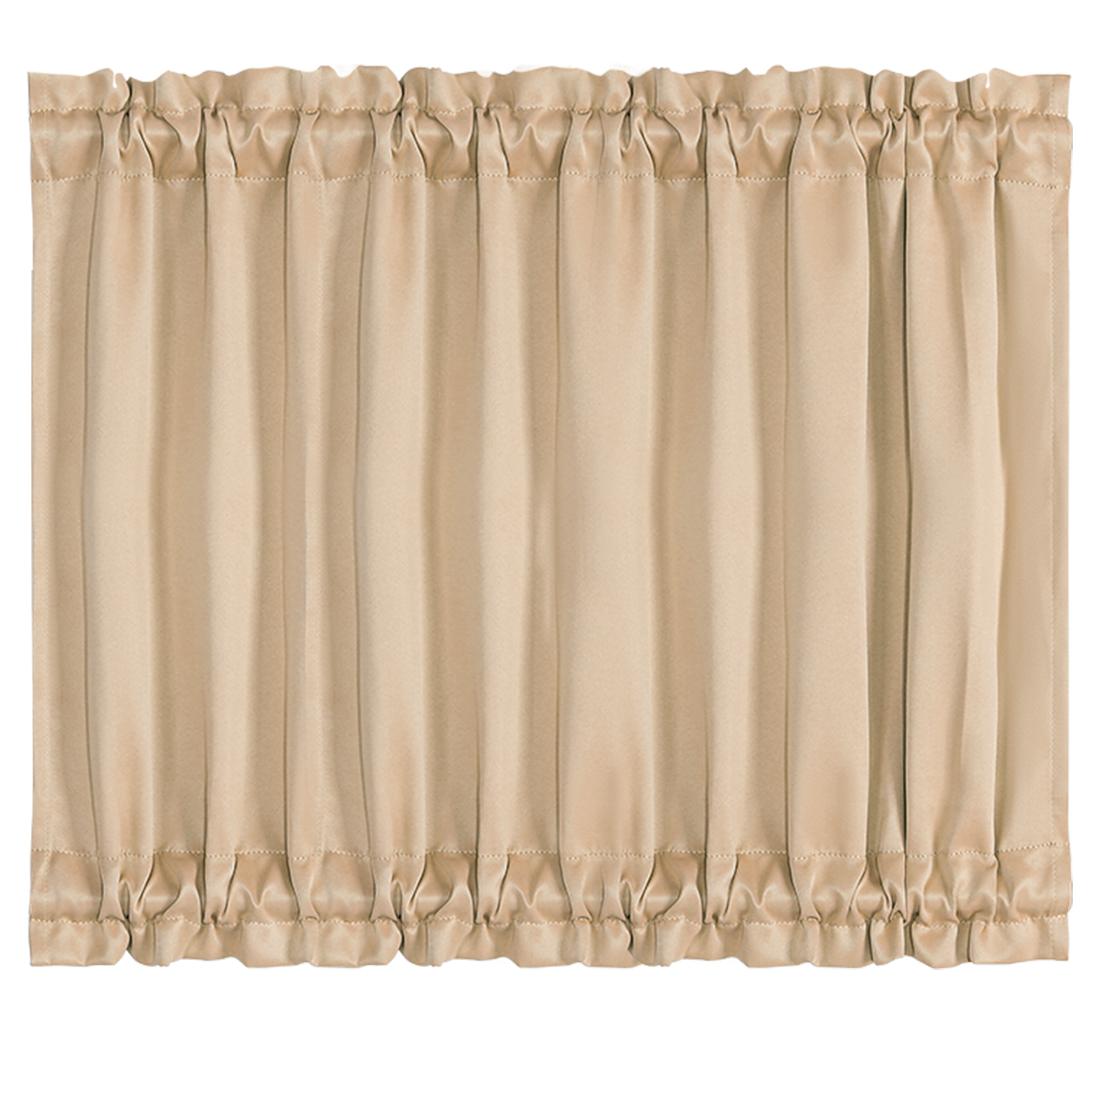 Elegant 54 x 40 Inch Blackout Curtains Rod Sliding Door Darkening Drapes Khaki